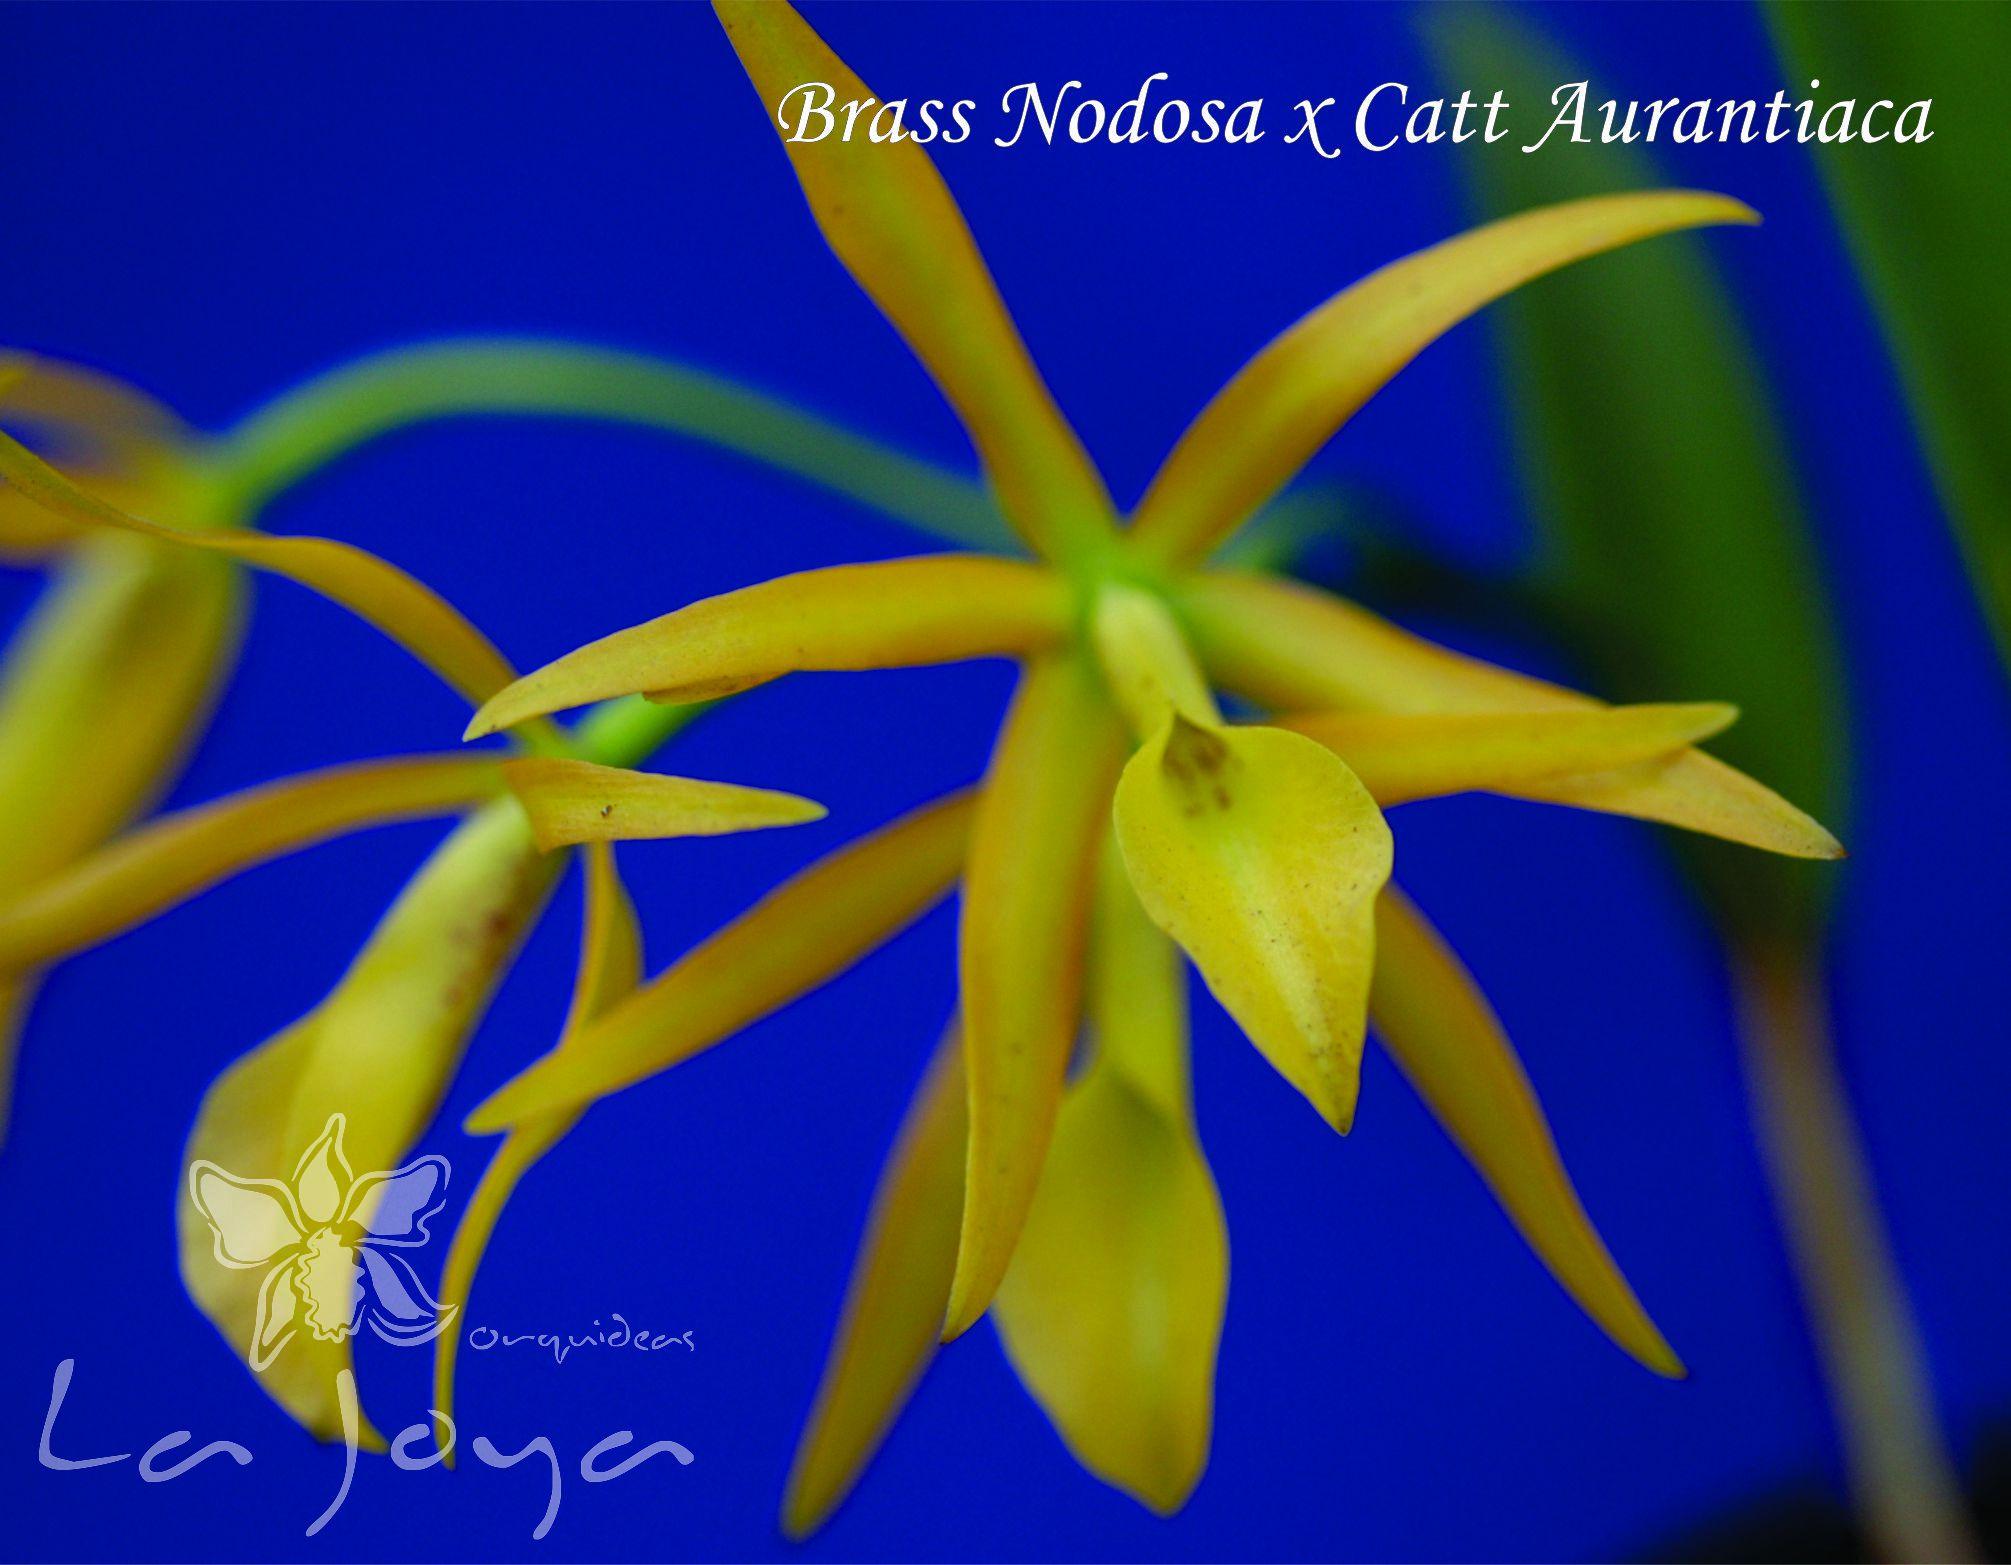 Brass Nodosa x Cattleya Aurantiaca